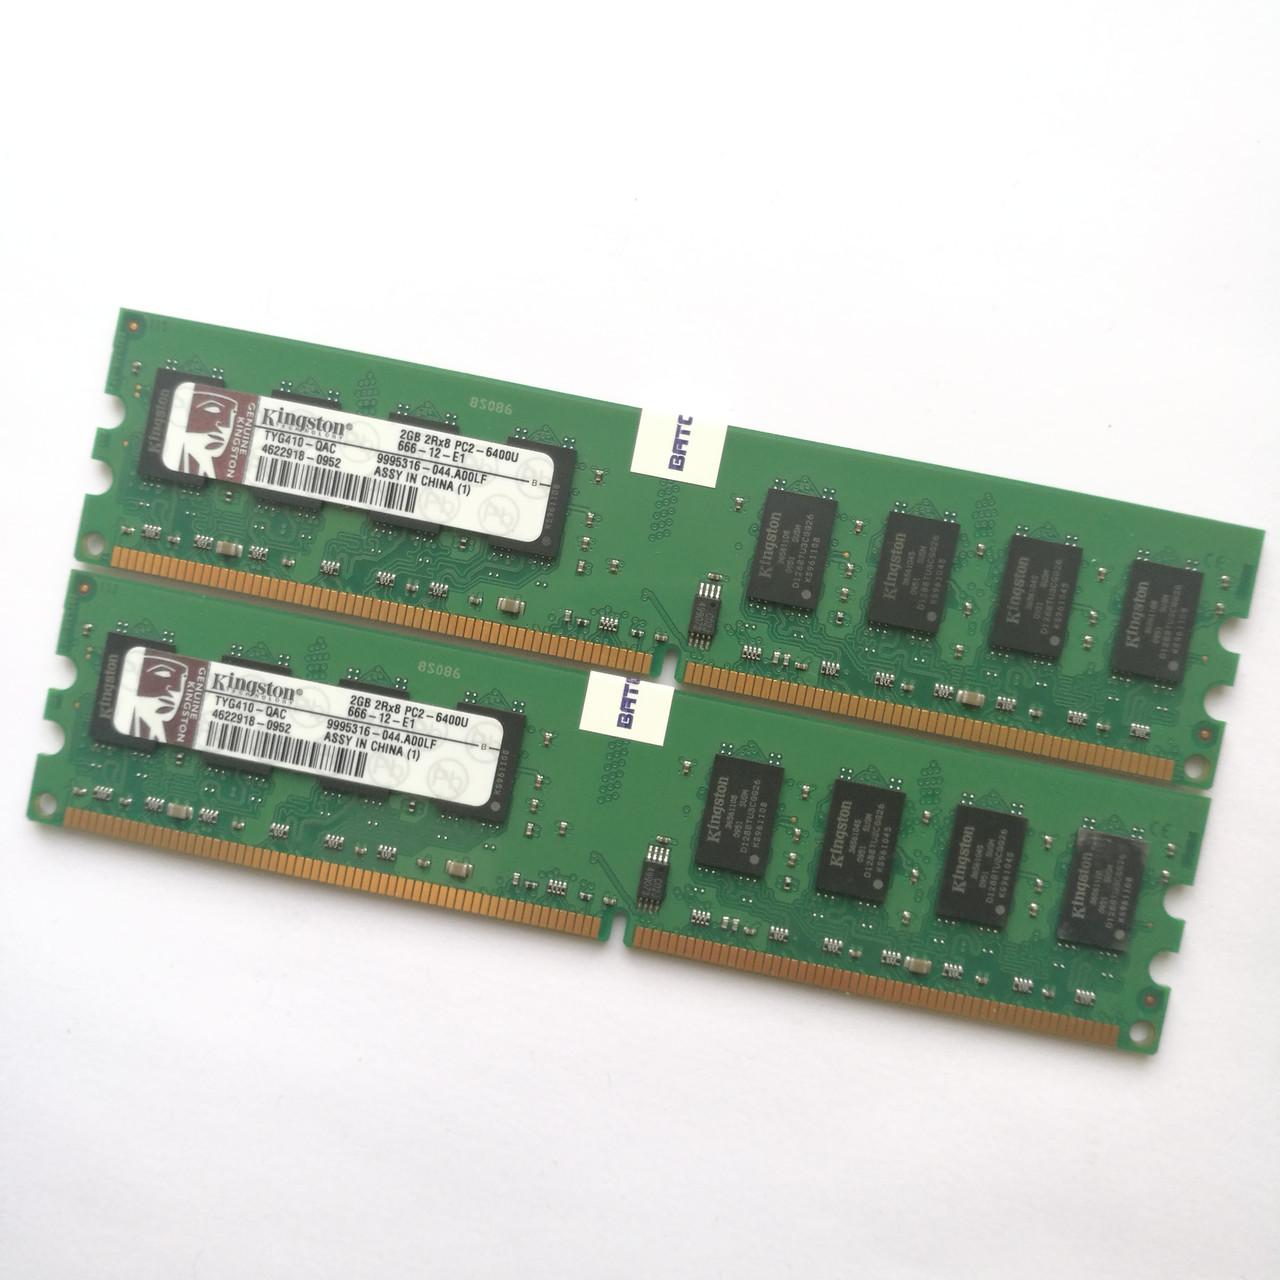 Оперативная память Kingston DDR2 4Gb (2Gb+2Gb) 800MHz PC2 6400U CL6 (TYG410-QAC) Б/У